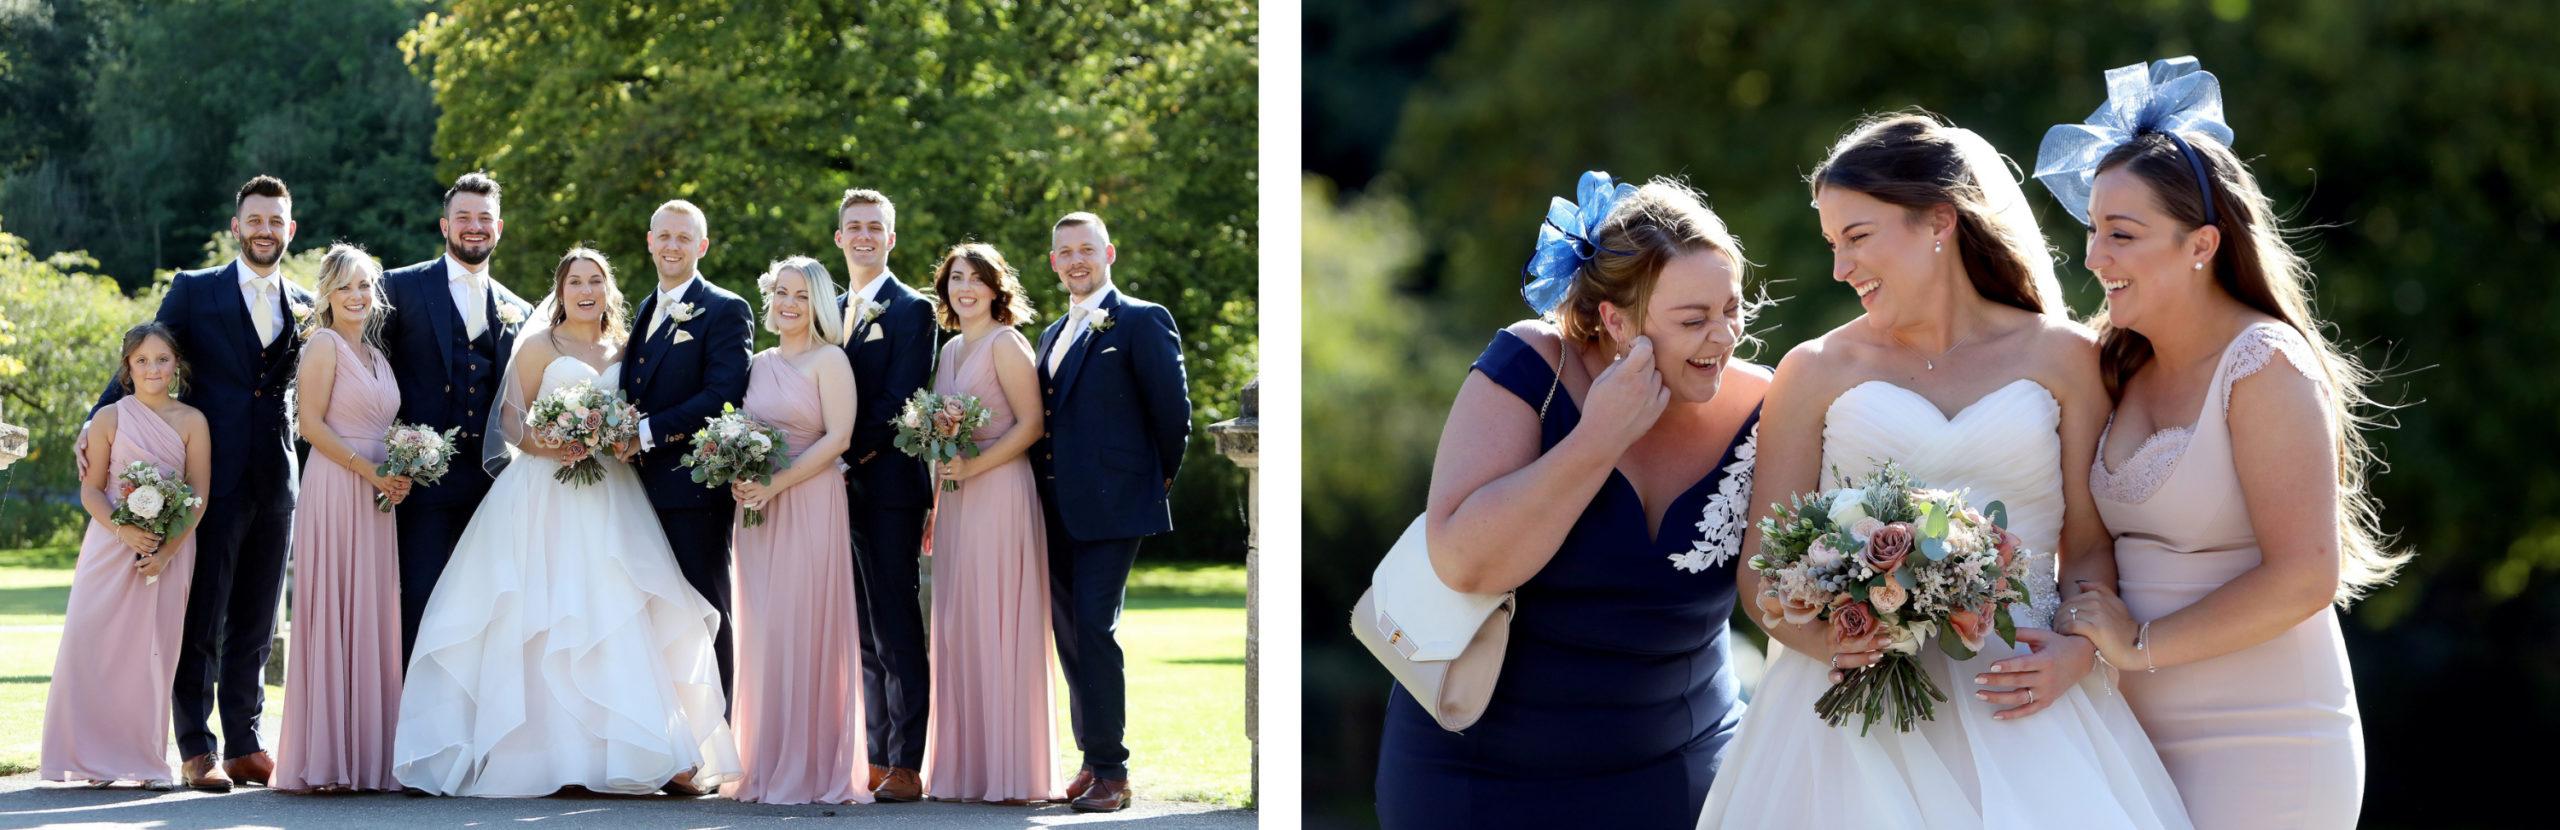 candid wedding group shots